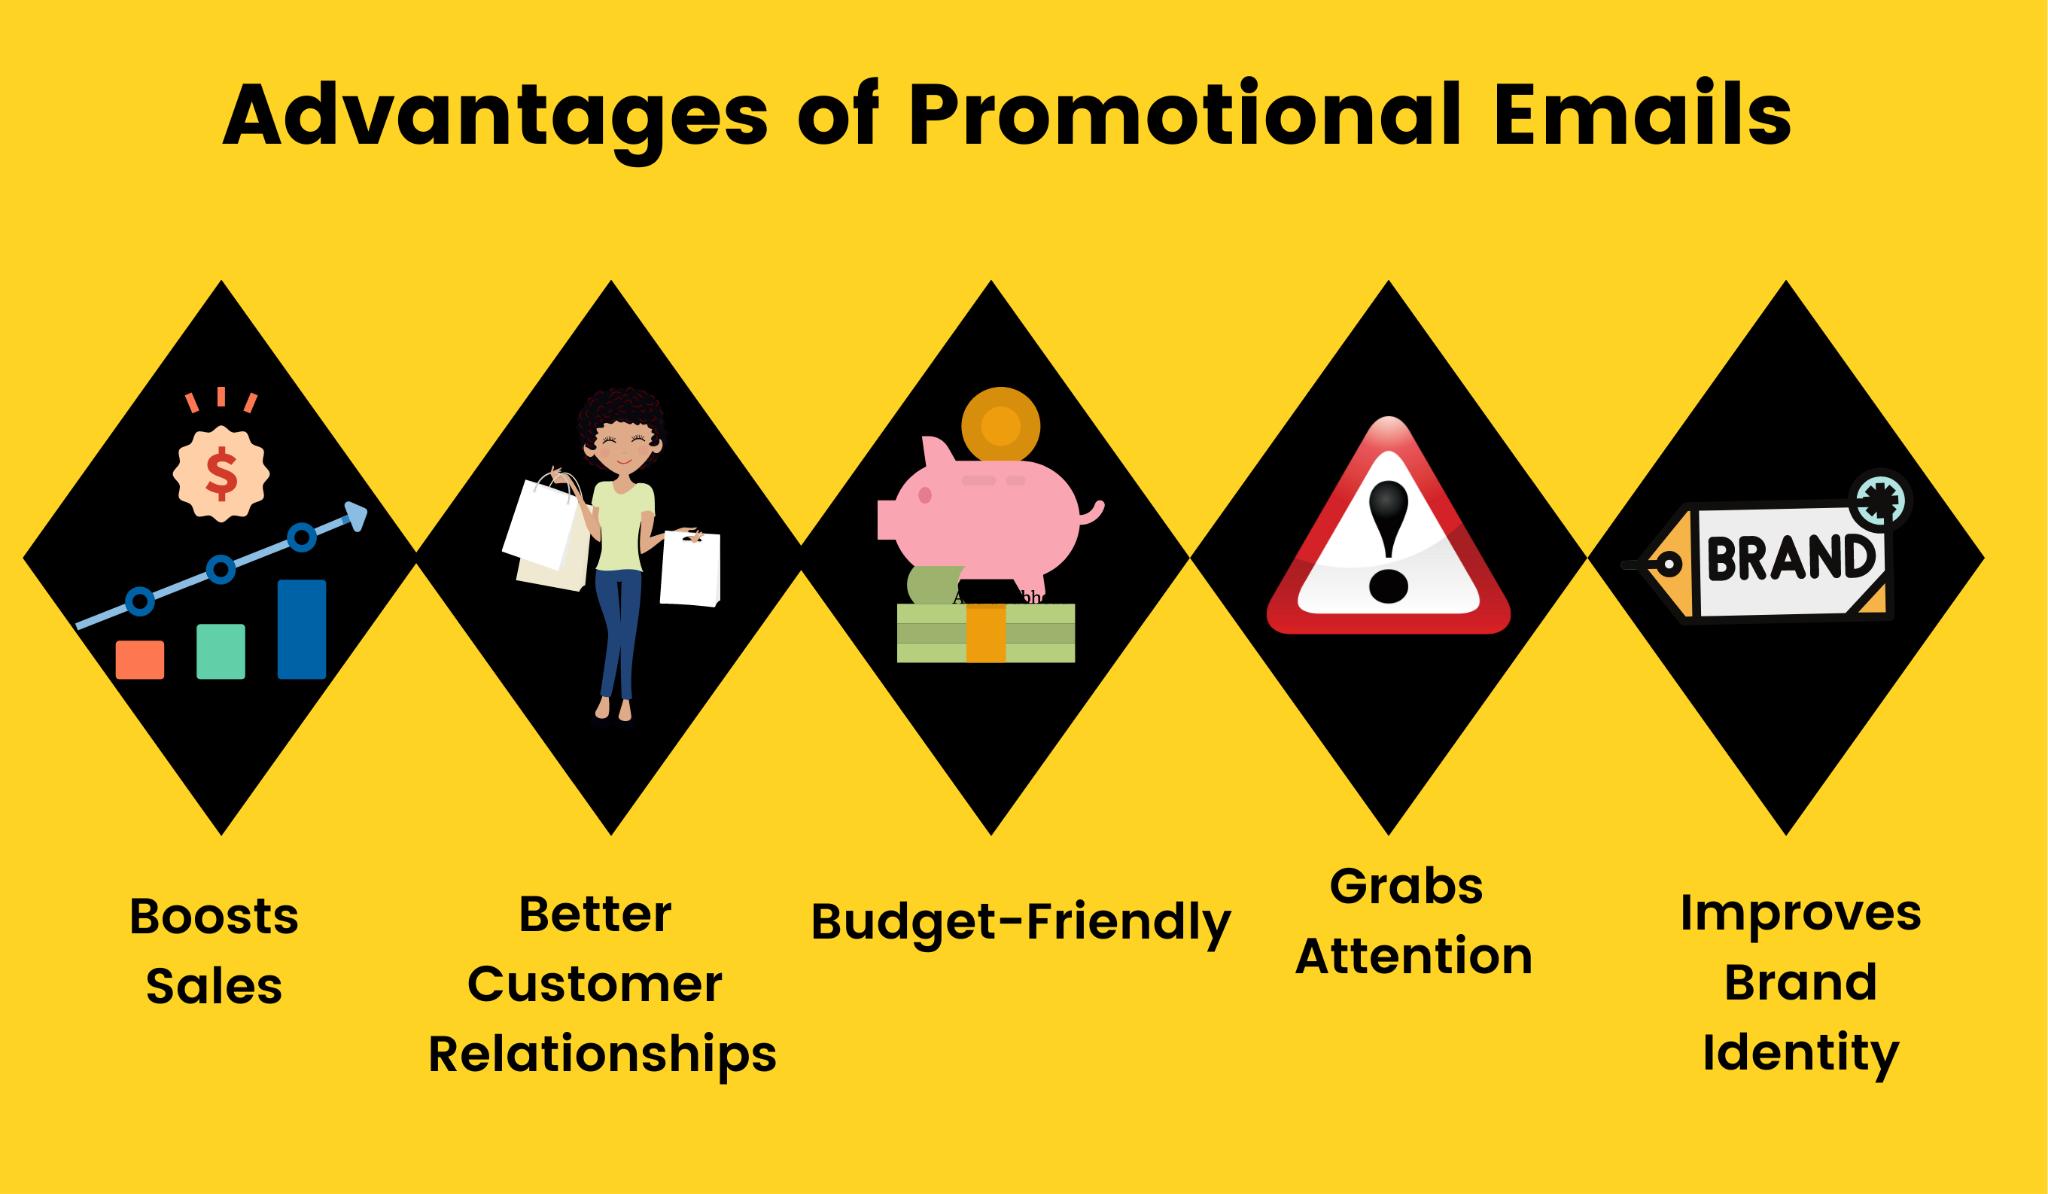 Advantages of sending promotional emails.